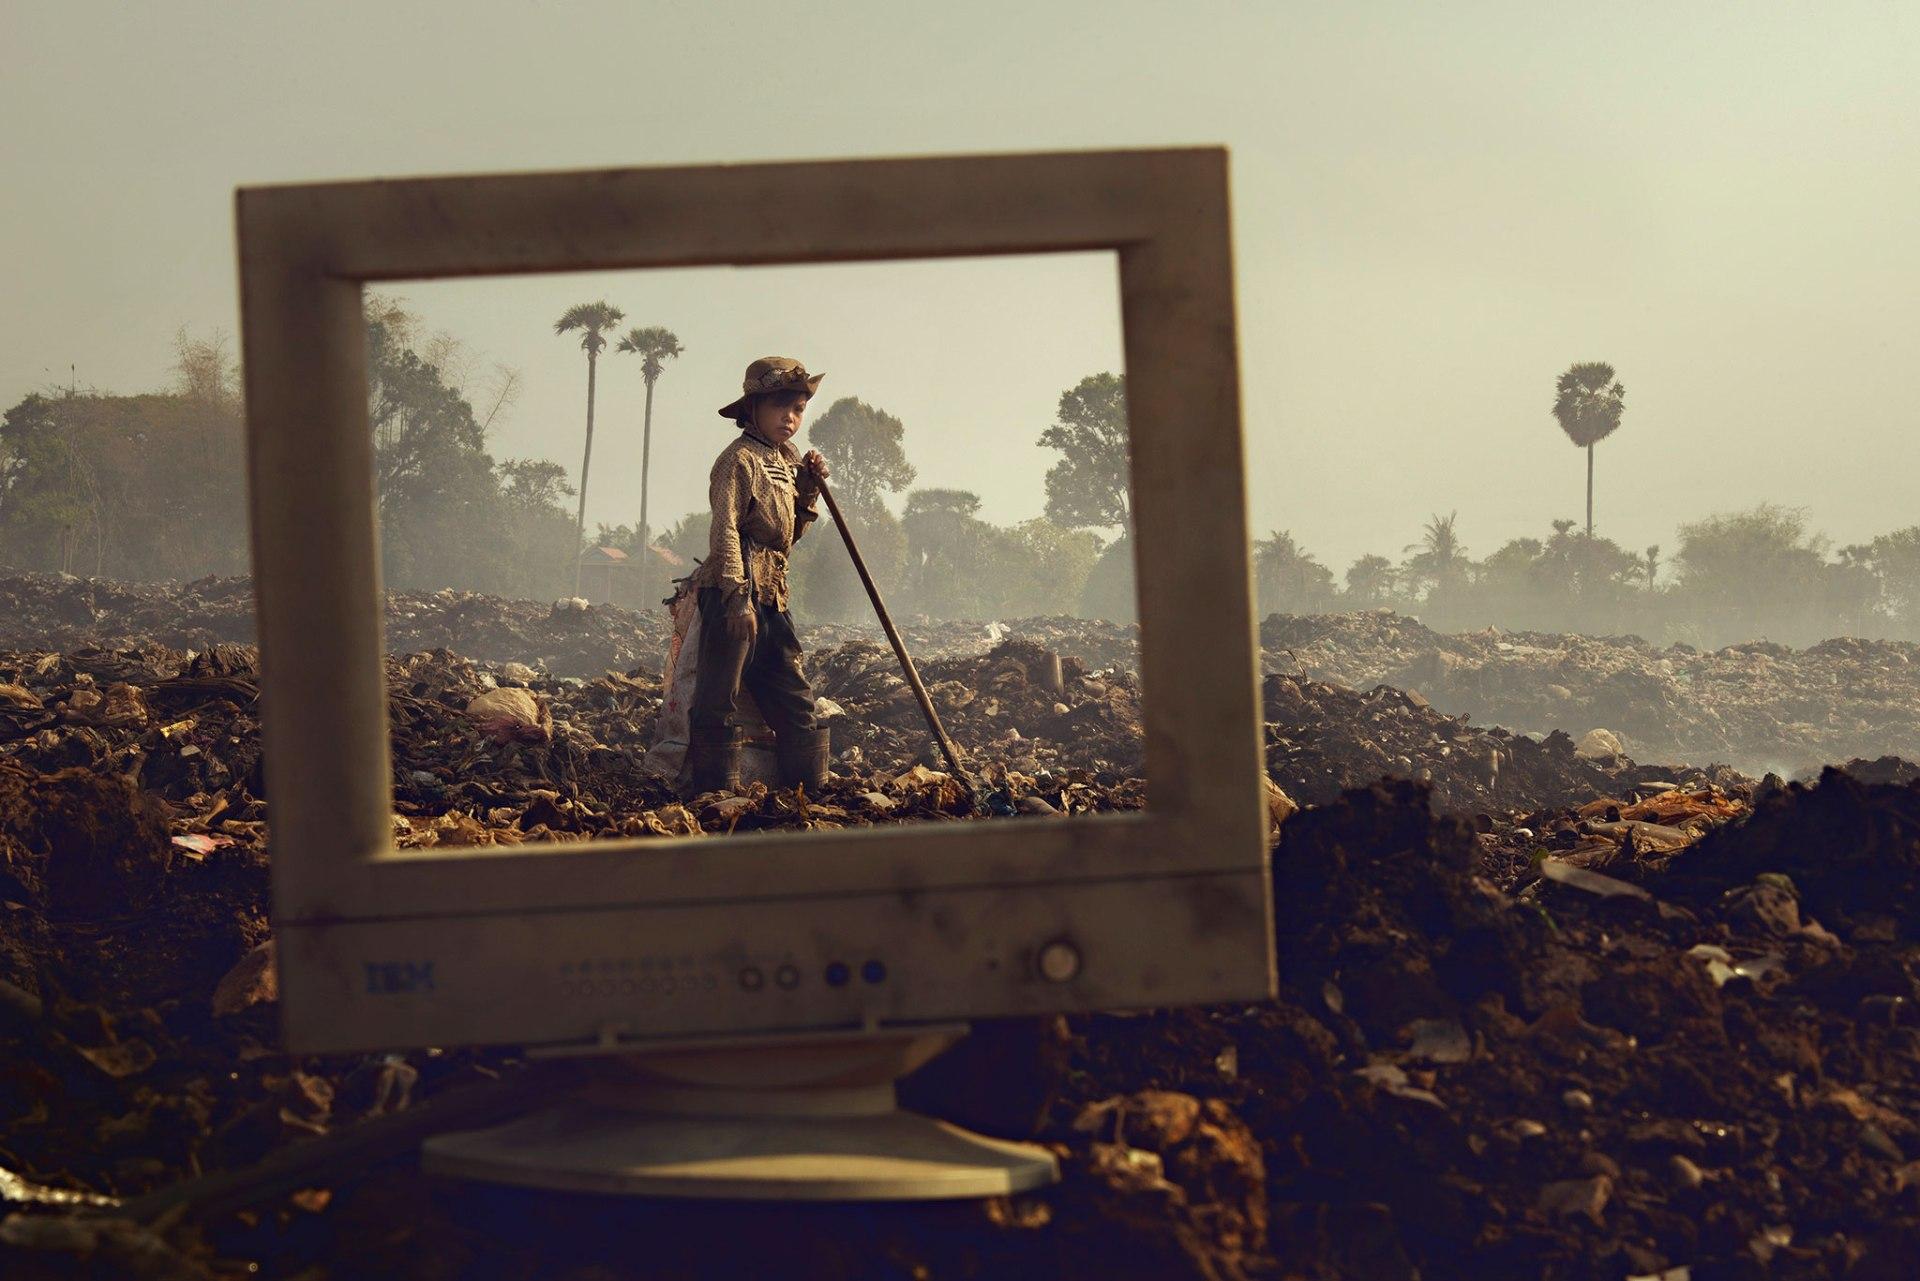 Poverty window - Be artist Be art